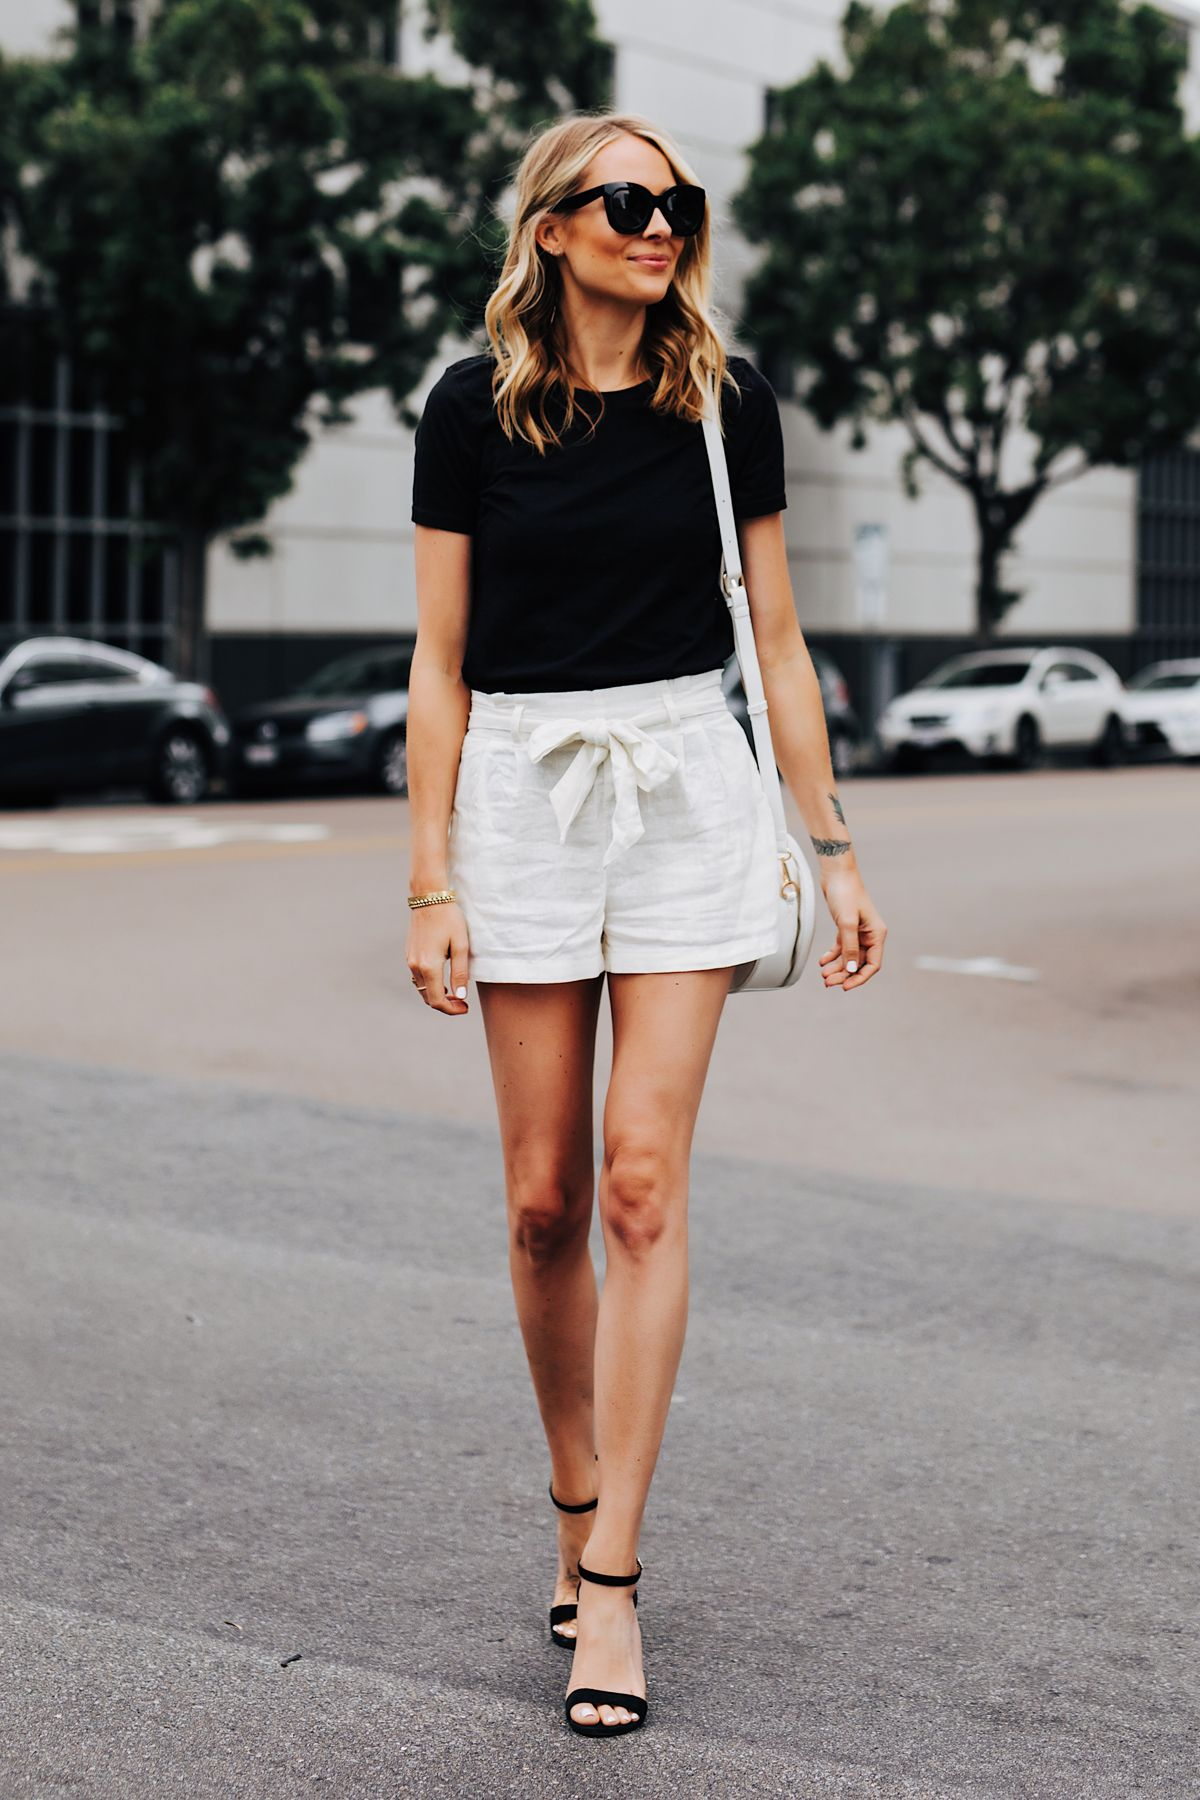 Fashion Jackson Wearing Black Tshirt White Tie Front Shorts Black Heeled Sandals Classy Casual Outfits Fashion Jackson Stylish Summer Outfits [ 1800 x 1200 Pixel ]